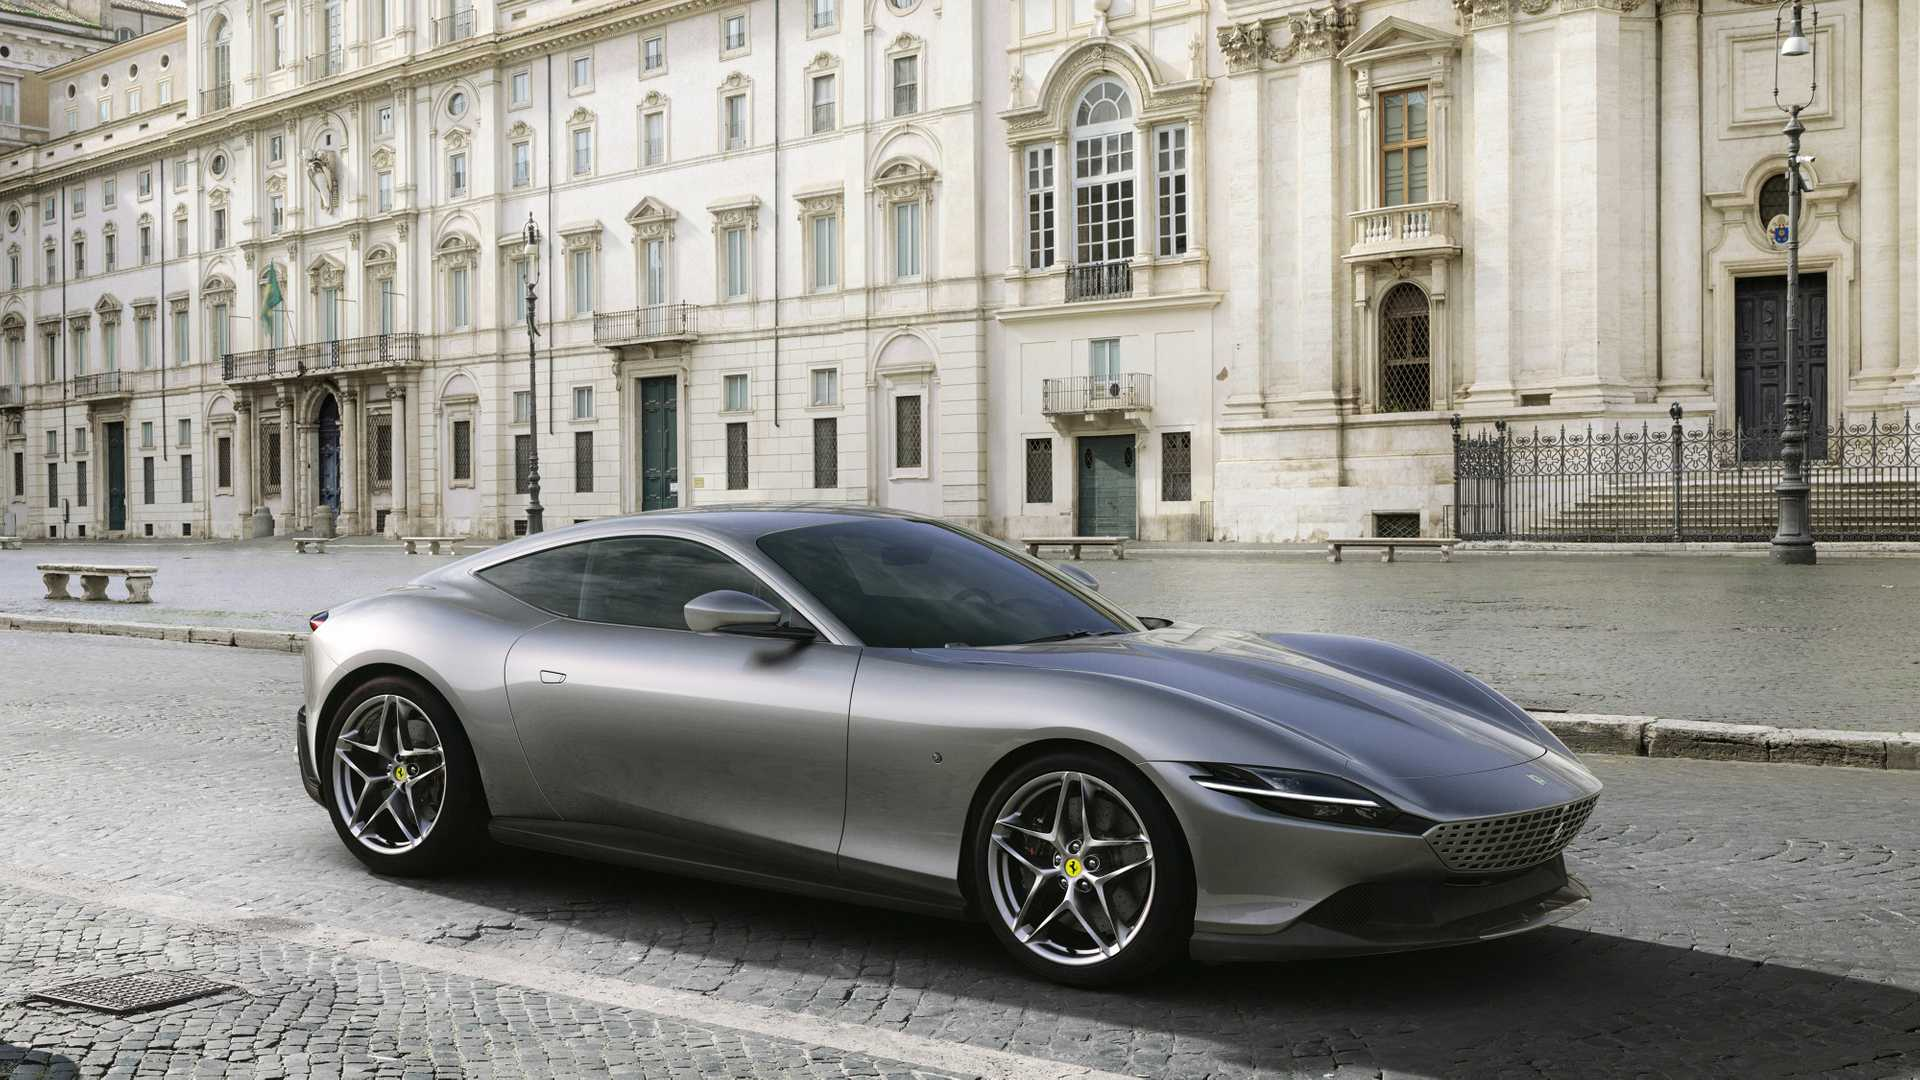 ferrari-roma-supercar-design-study-looks-absolutely-gorgeous_11.jpg